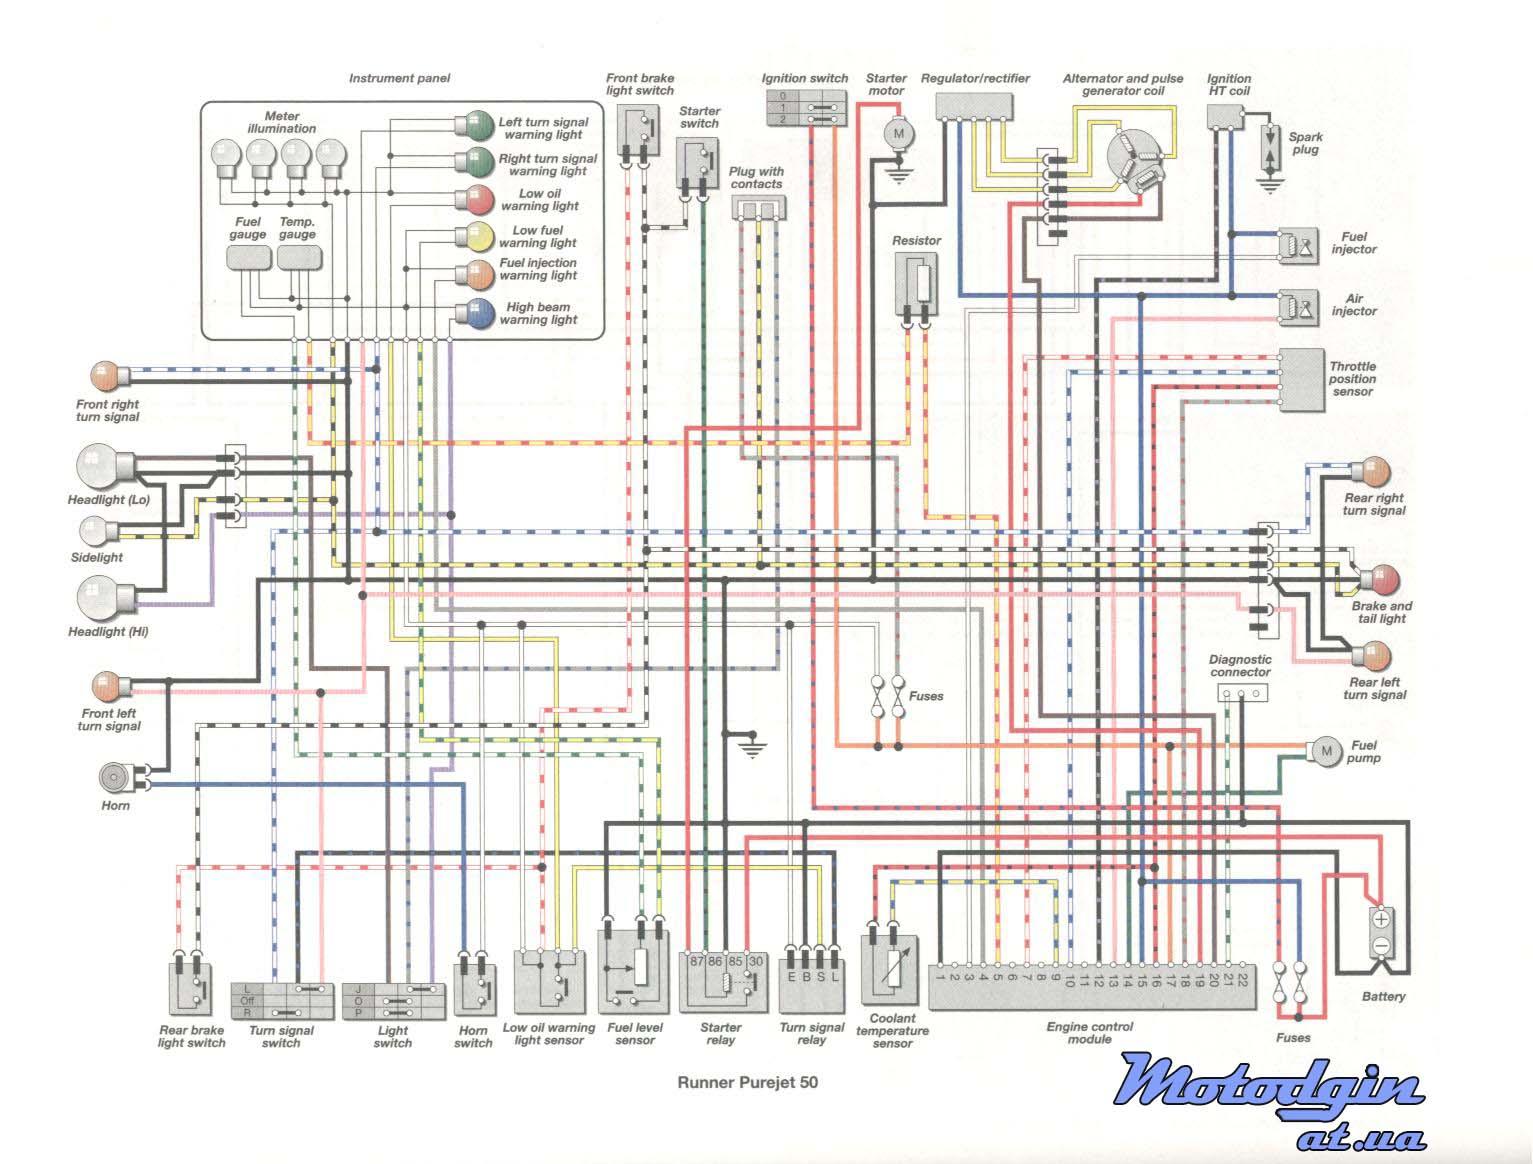 Schema Elettrico Nrg Power : Gilera Схемы электрооборудования Мотоджин ремонт